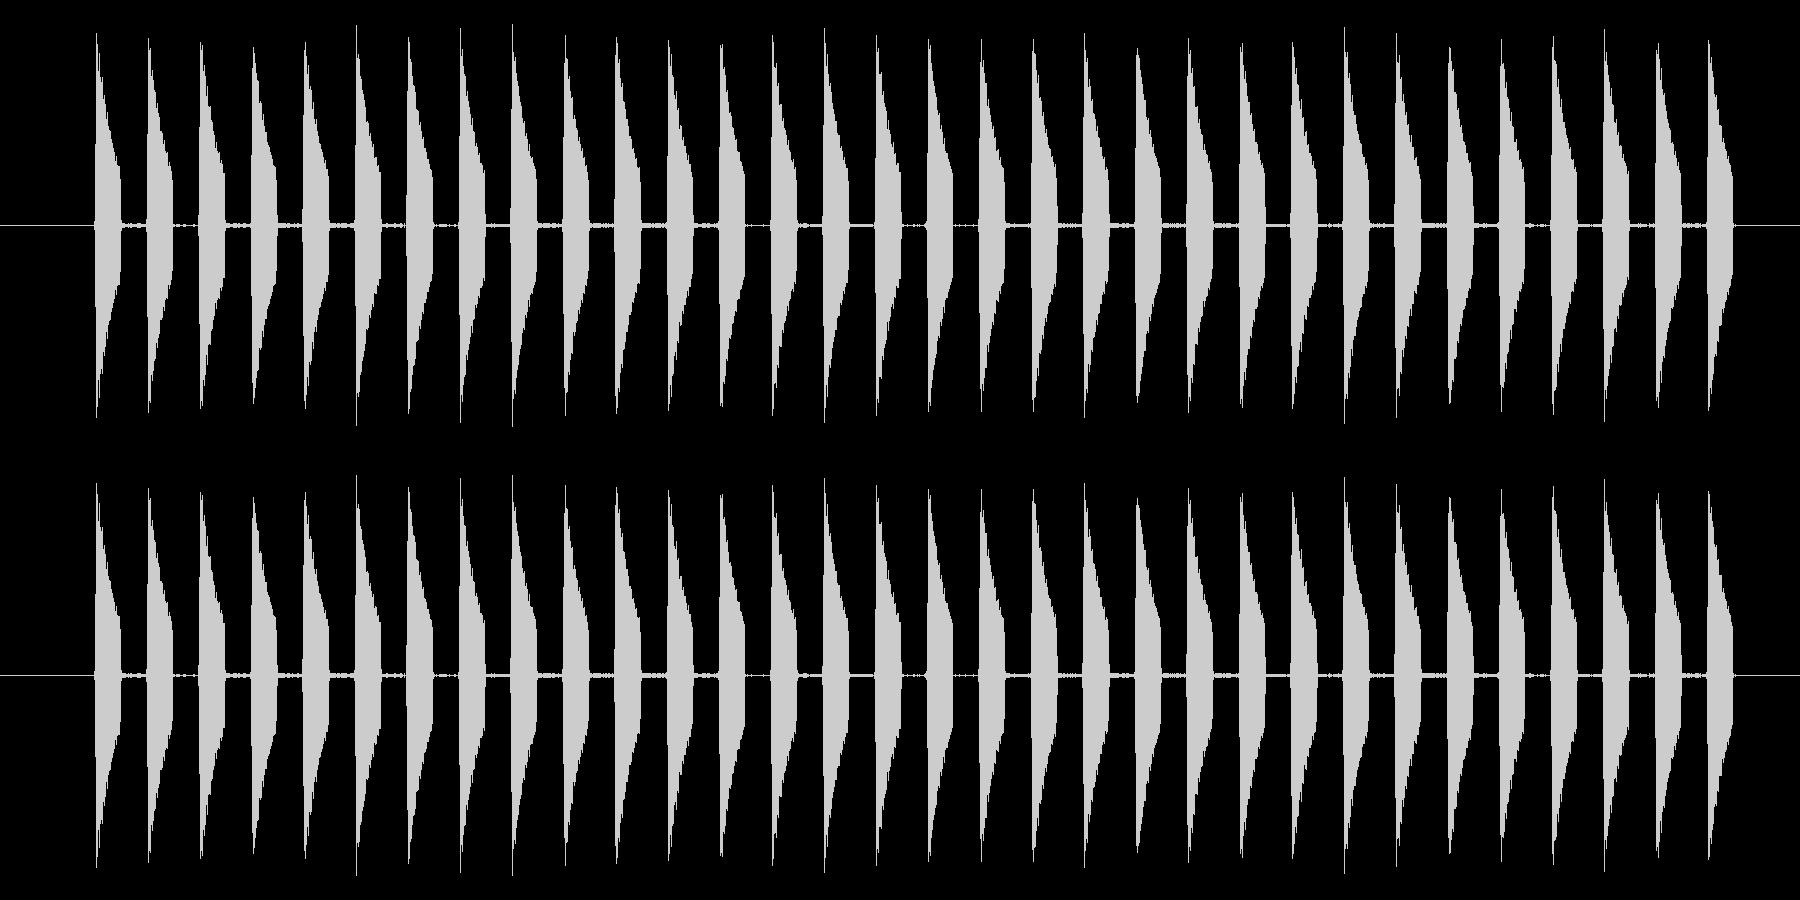 NES アクション01-16(スコア)の未再生の波形